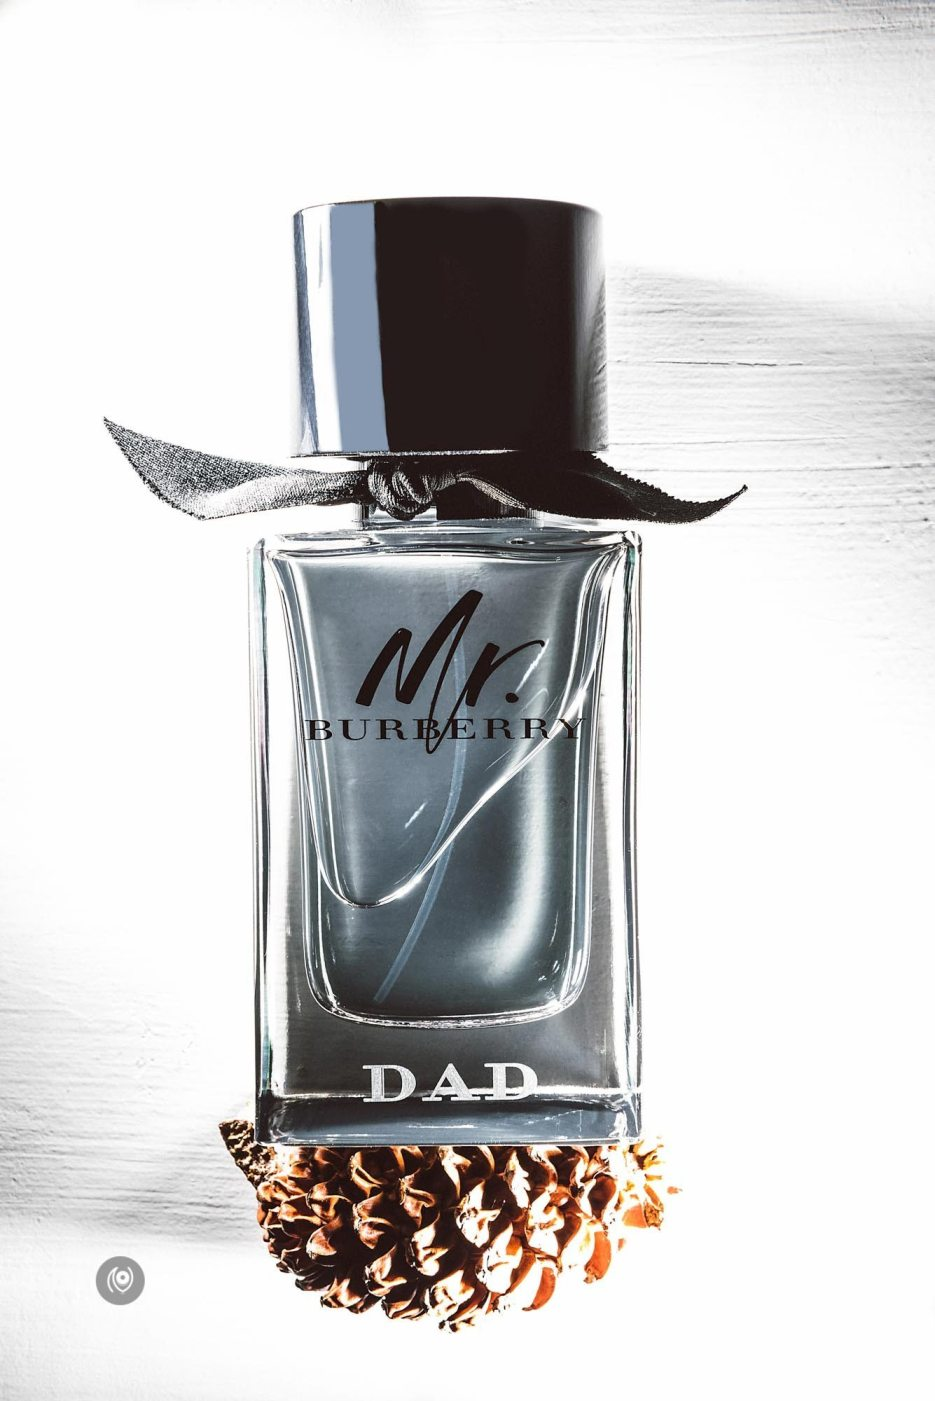 Naina.co, Visual Storyteller, Luxury Brands, Naina Redhu, Professional Photographer, Experience Collector, Luxury Photographer, Luxury Blogger, Lifestyle, Visual Storyteller for Luxury Brands, Mr. Burberry, Burberry, Father's Day, Parfumier, Aqua, Woody, Musk, Fragrance, Perfume, Scent, #FragranceOfTheMonth, FragranceOfTheMonth, Fragrance Of The Month, Francis Kurkdjian